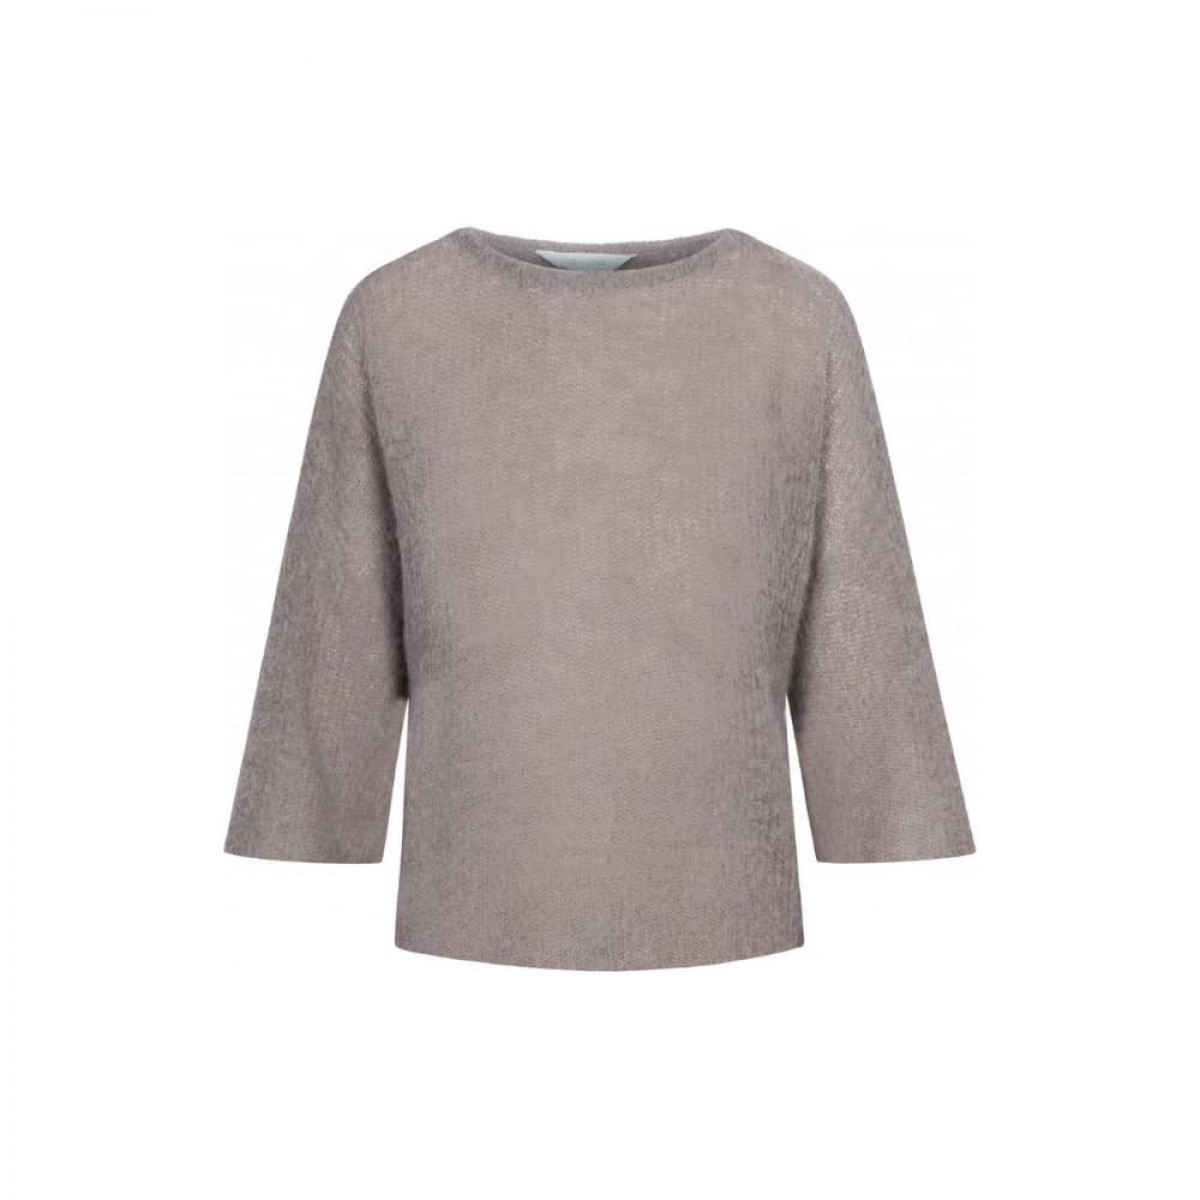 edda strik bluse - hazy brown